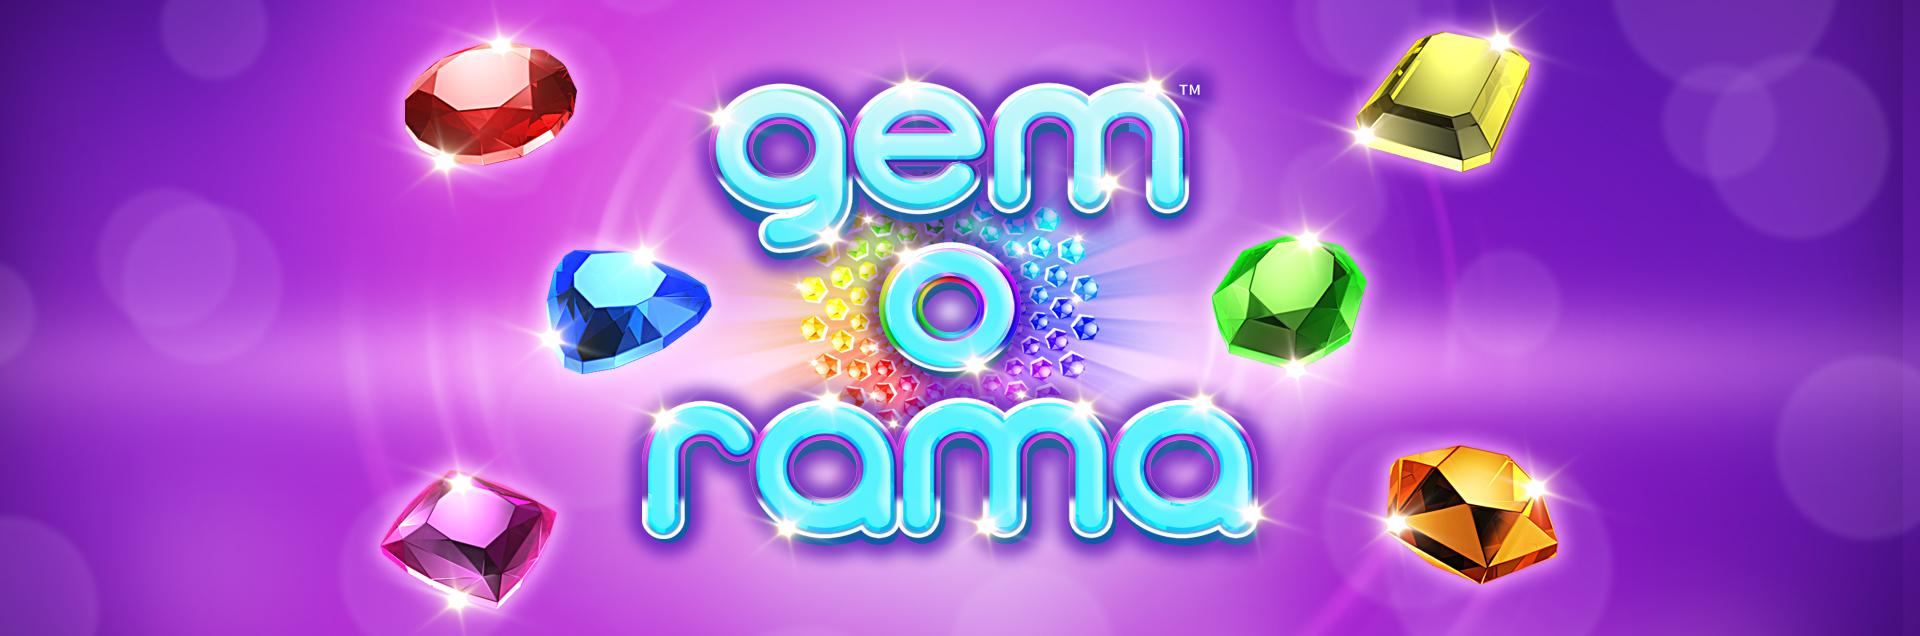 Gemorama logo